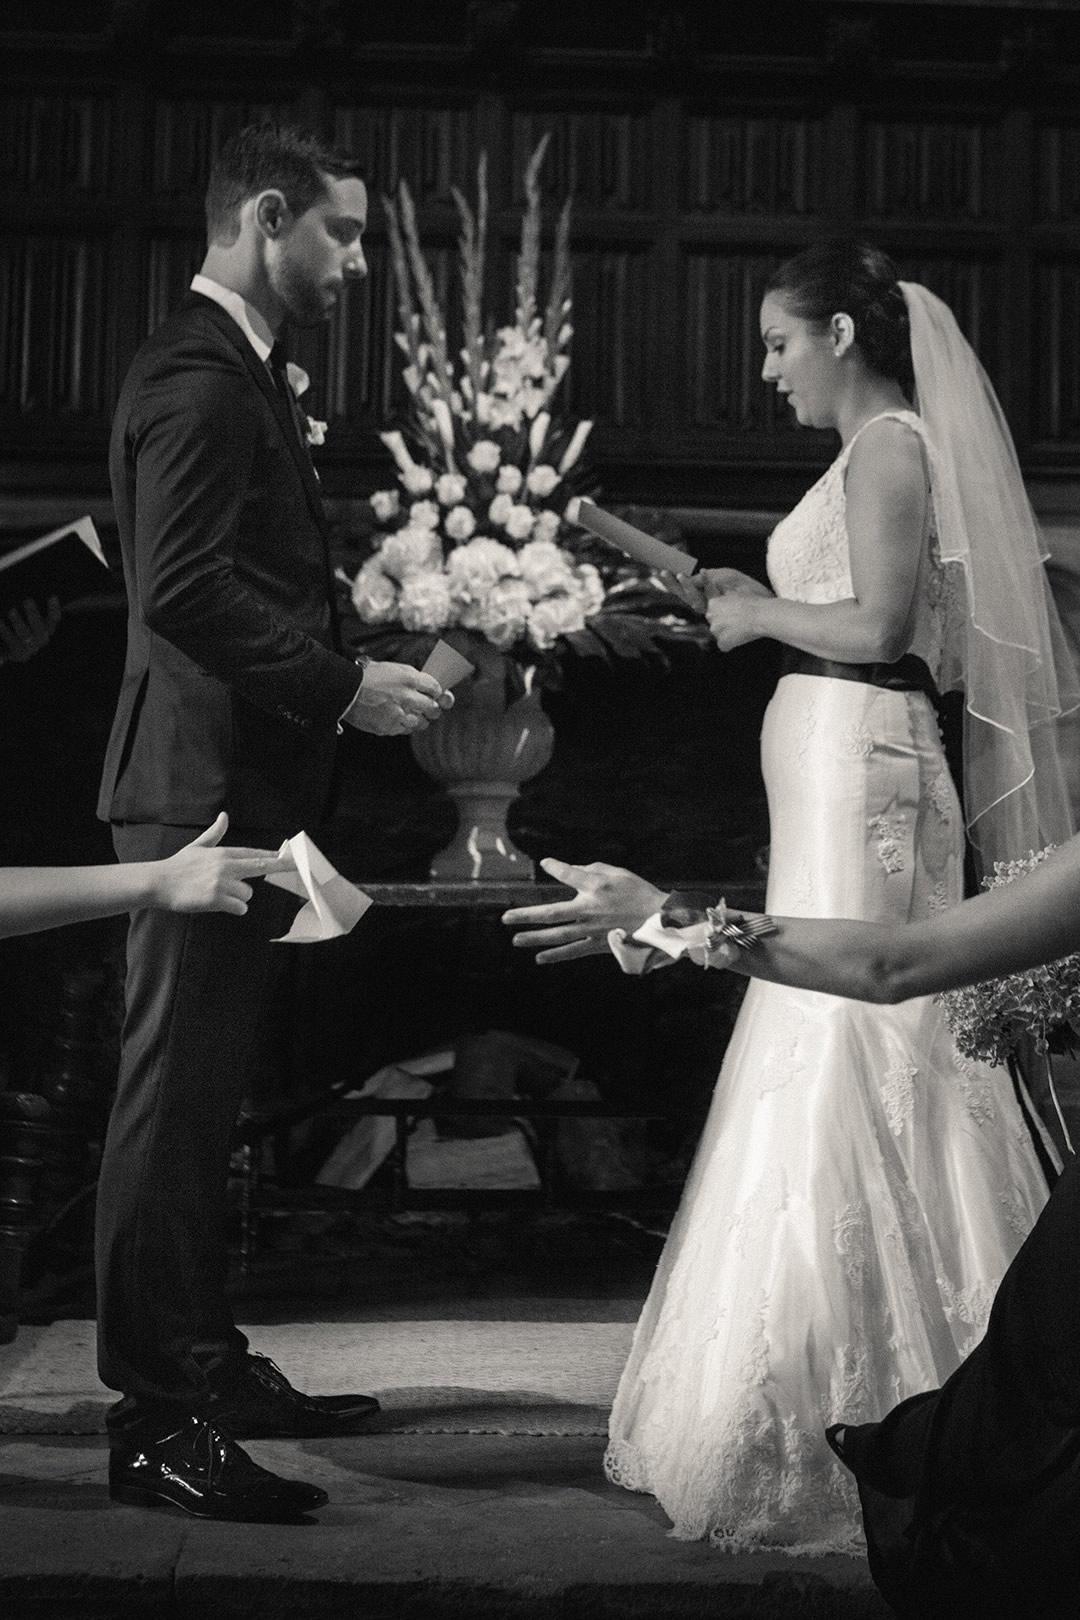 Linus Moran Photography – Documentary Wedding Photography Winner 2015